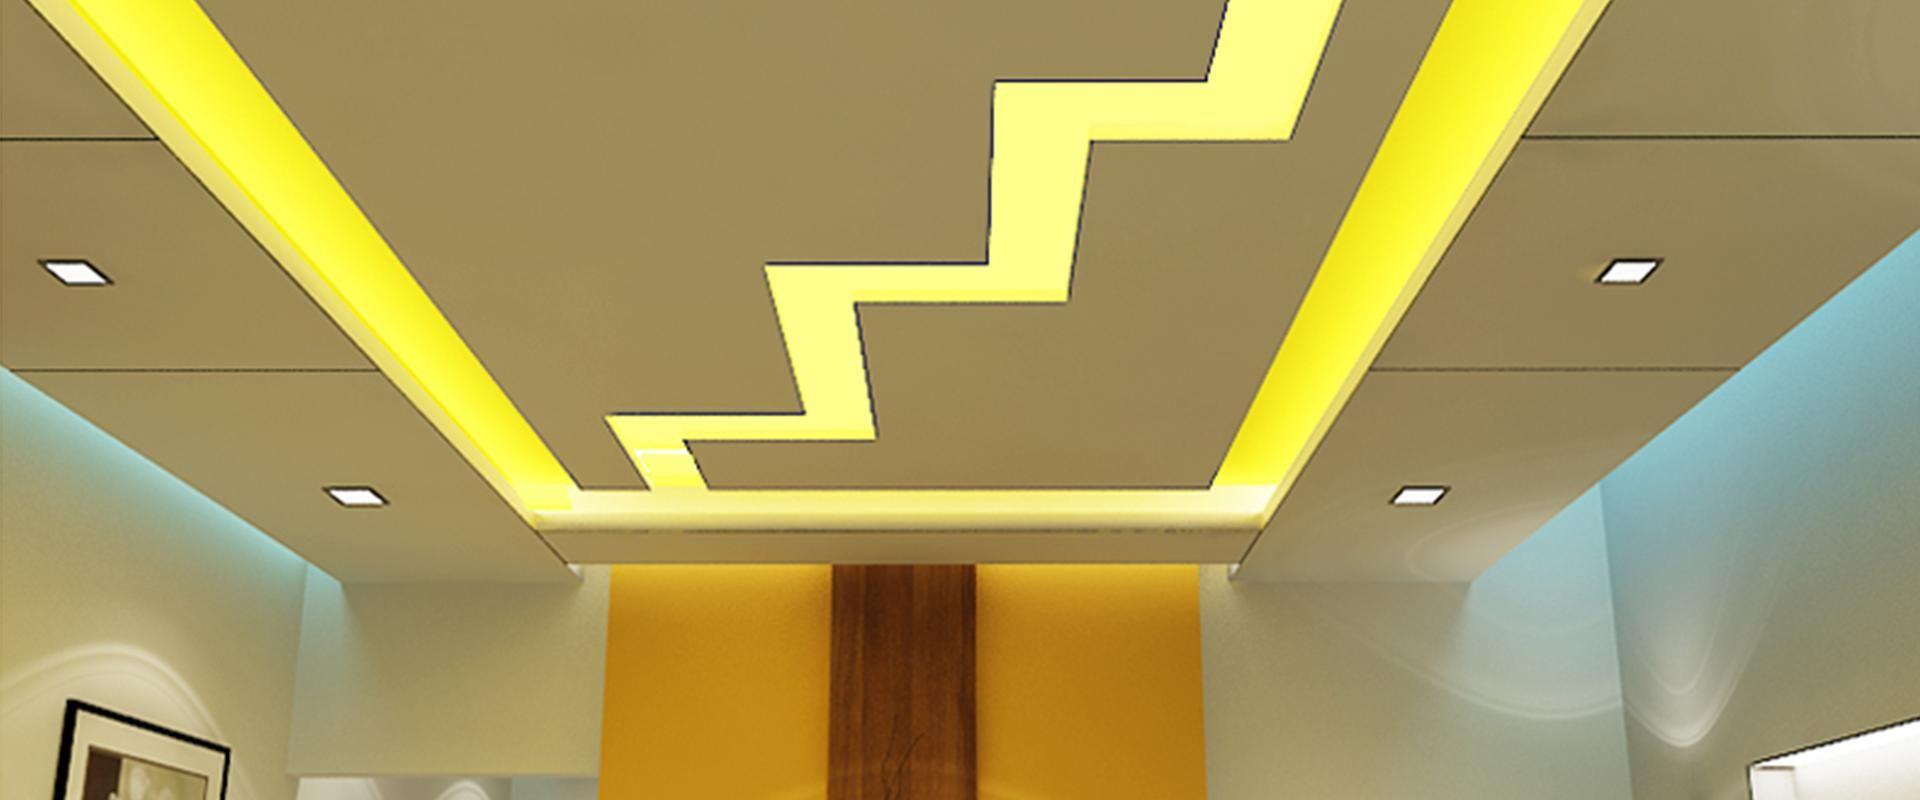 Living room false ceiling gypsum board drywall plaster living room false ceiling gypsum board drywall plaster saint gobain dailygadgetfo Images